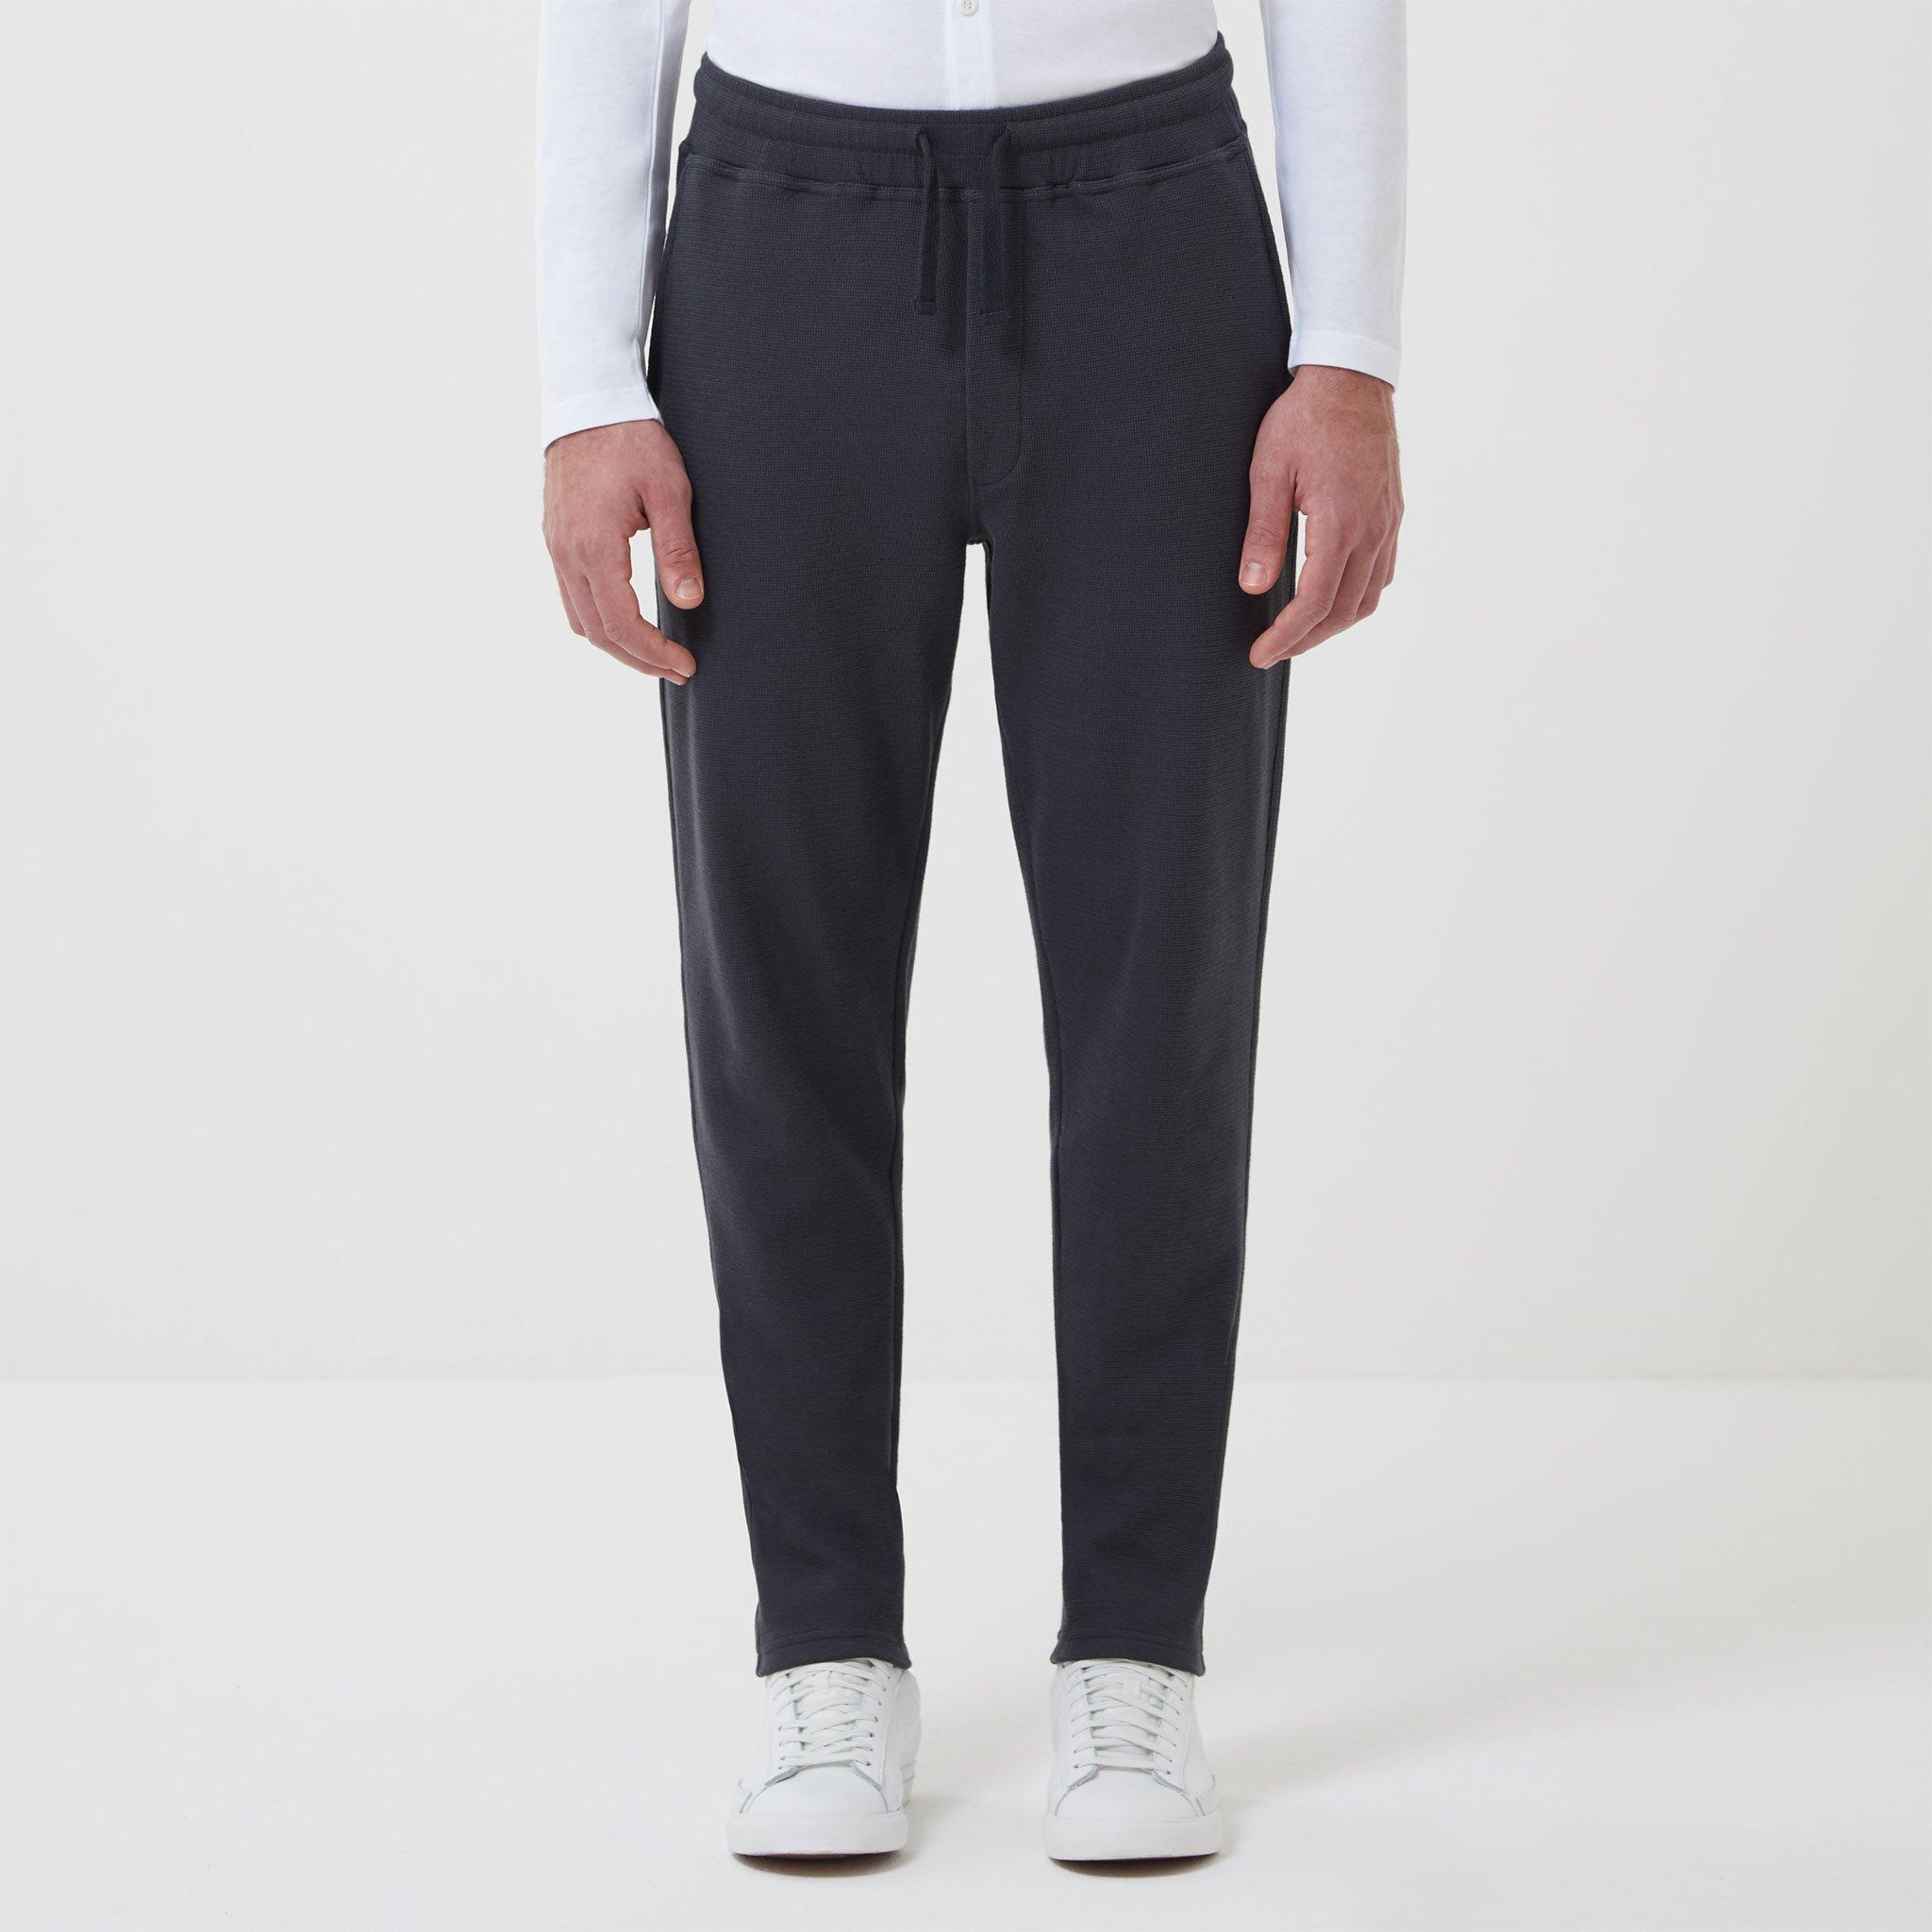 Lux-Drawstring-Trouser-Model-Grey_01.jpg